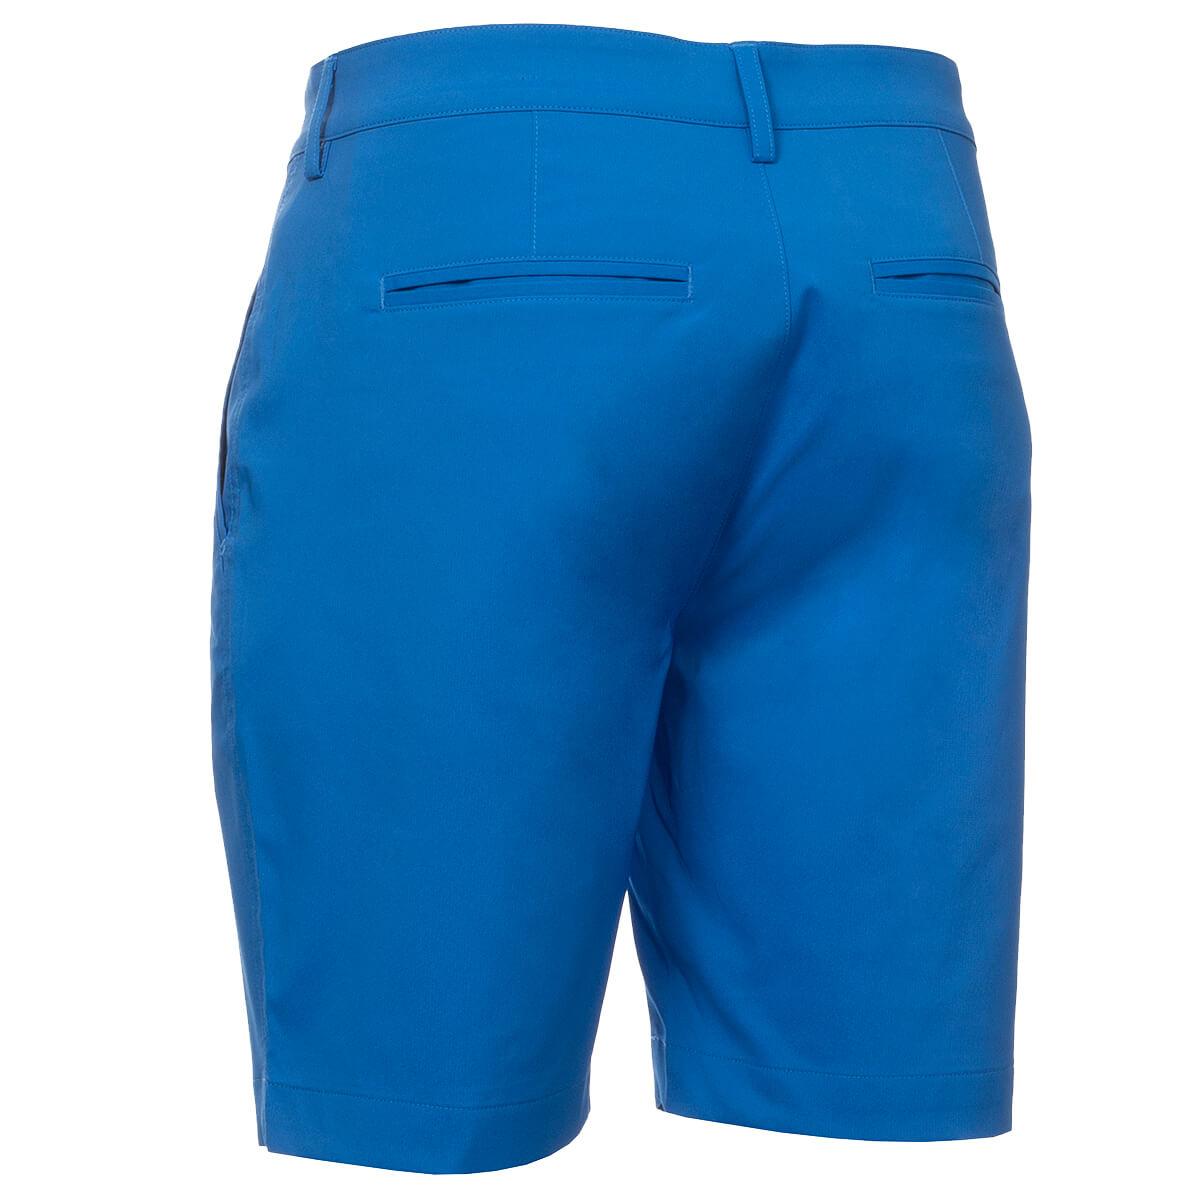 thumbnail 9 - Calvin Klein Mens 2021 Slim Fit Micro Tech Lightweight Golf Shorts 34% OFF RRP